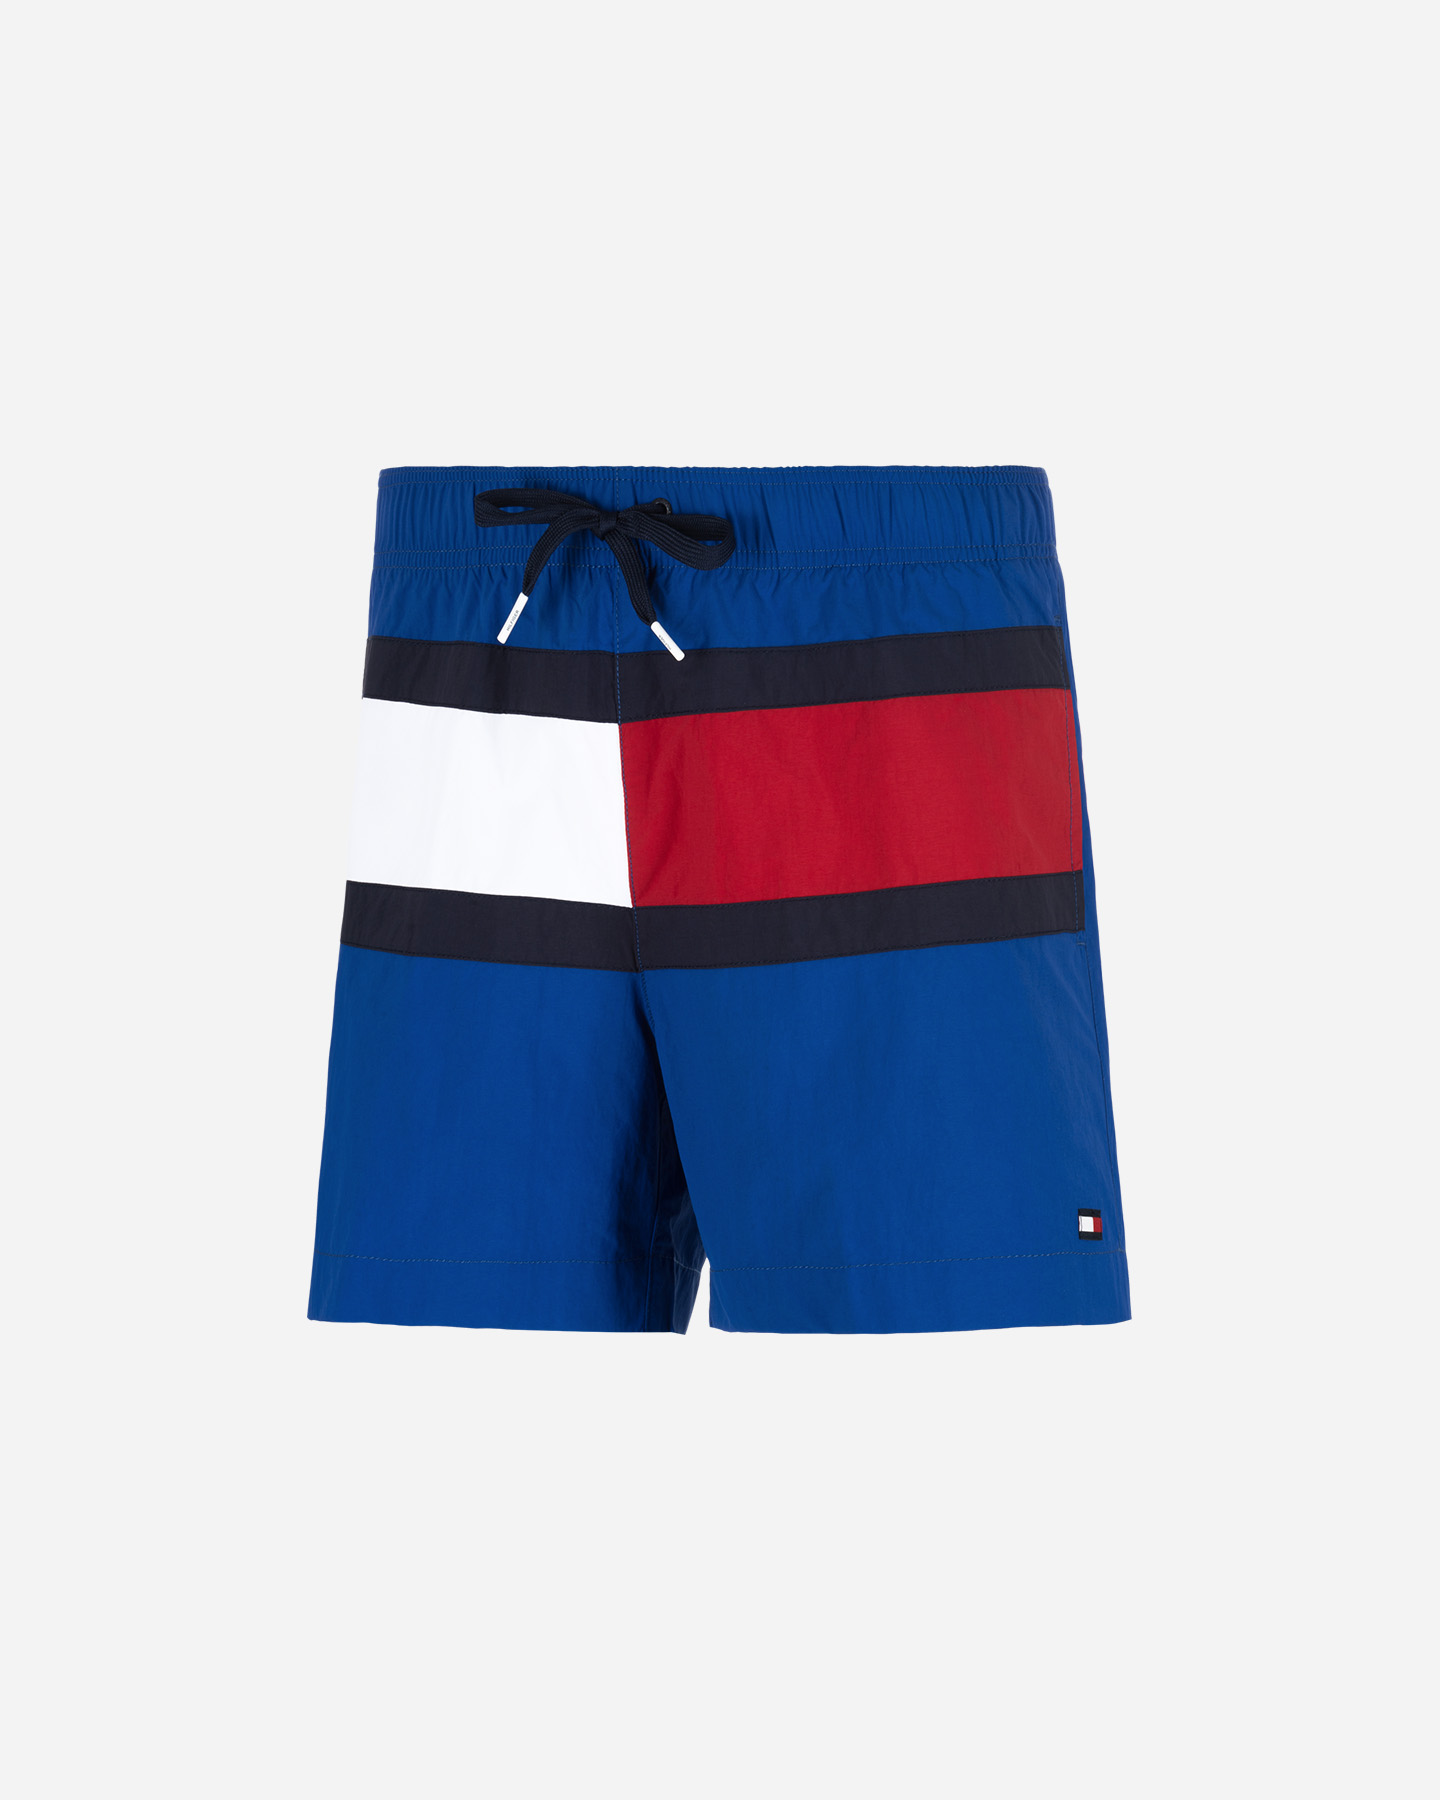 8da9673289f4 Boxer Mare Tommy Hilfiger Basic M UM0UM01070405 | Cisalfa Sport